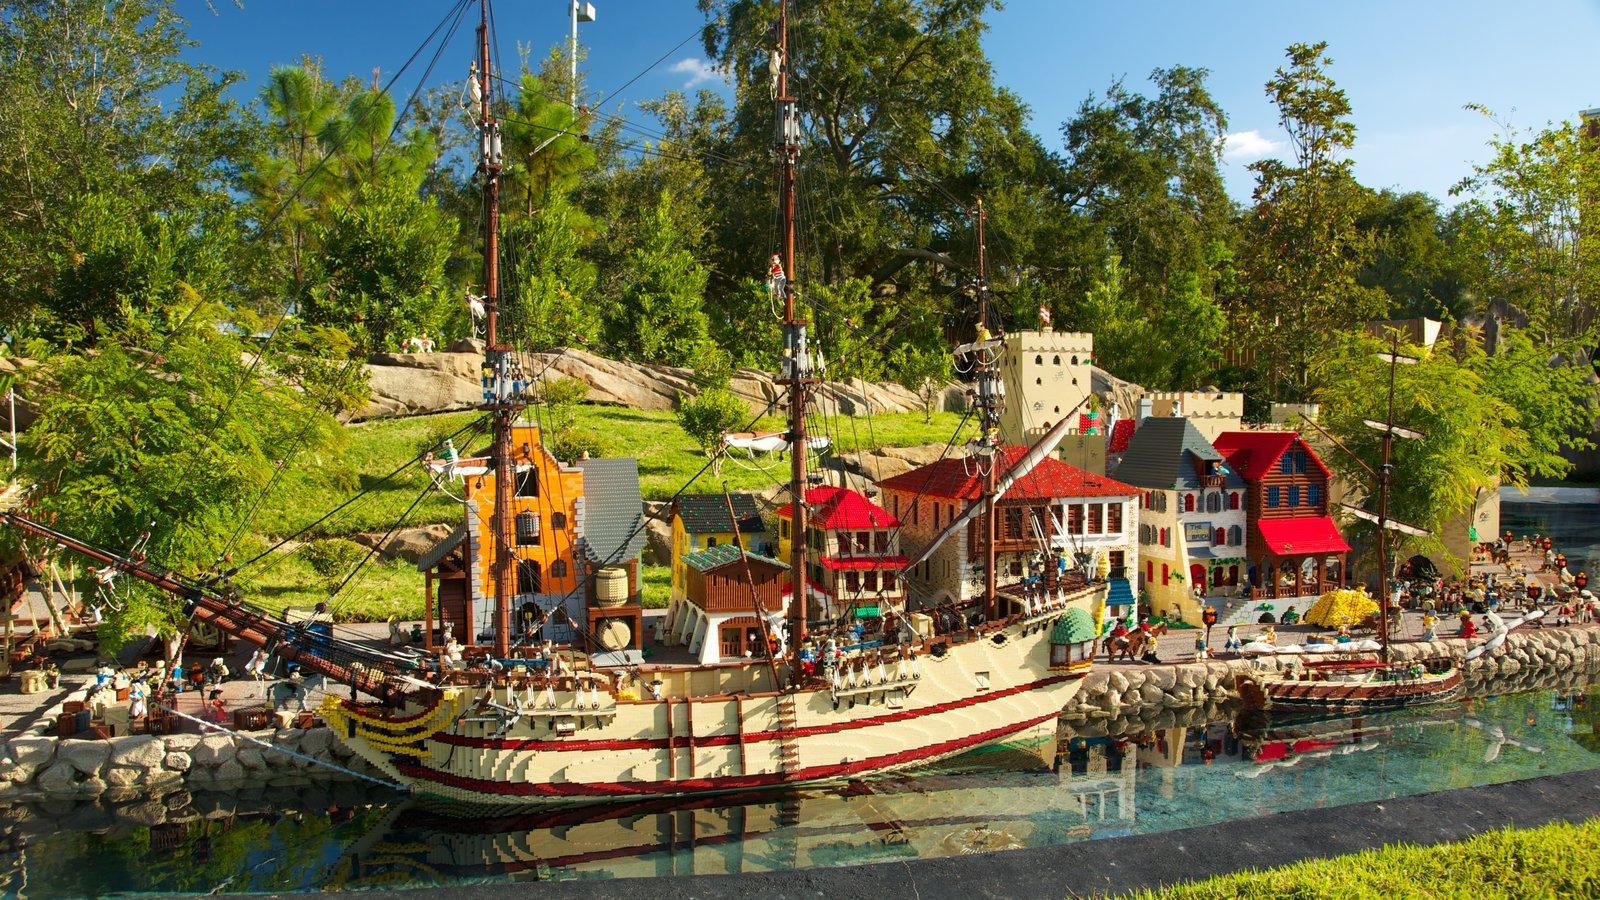 Legoland Florida showing rides, landscape views and boating